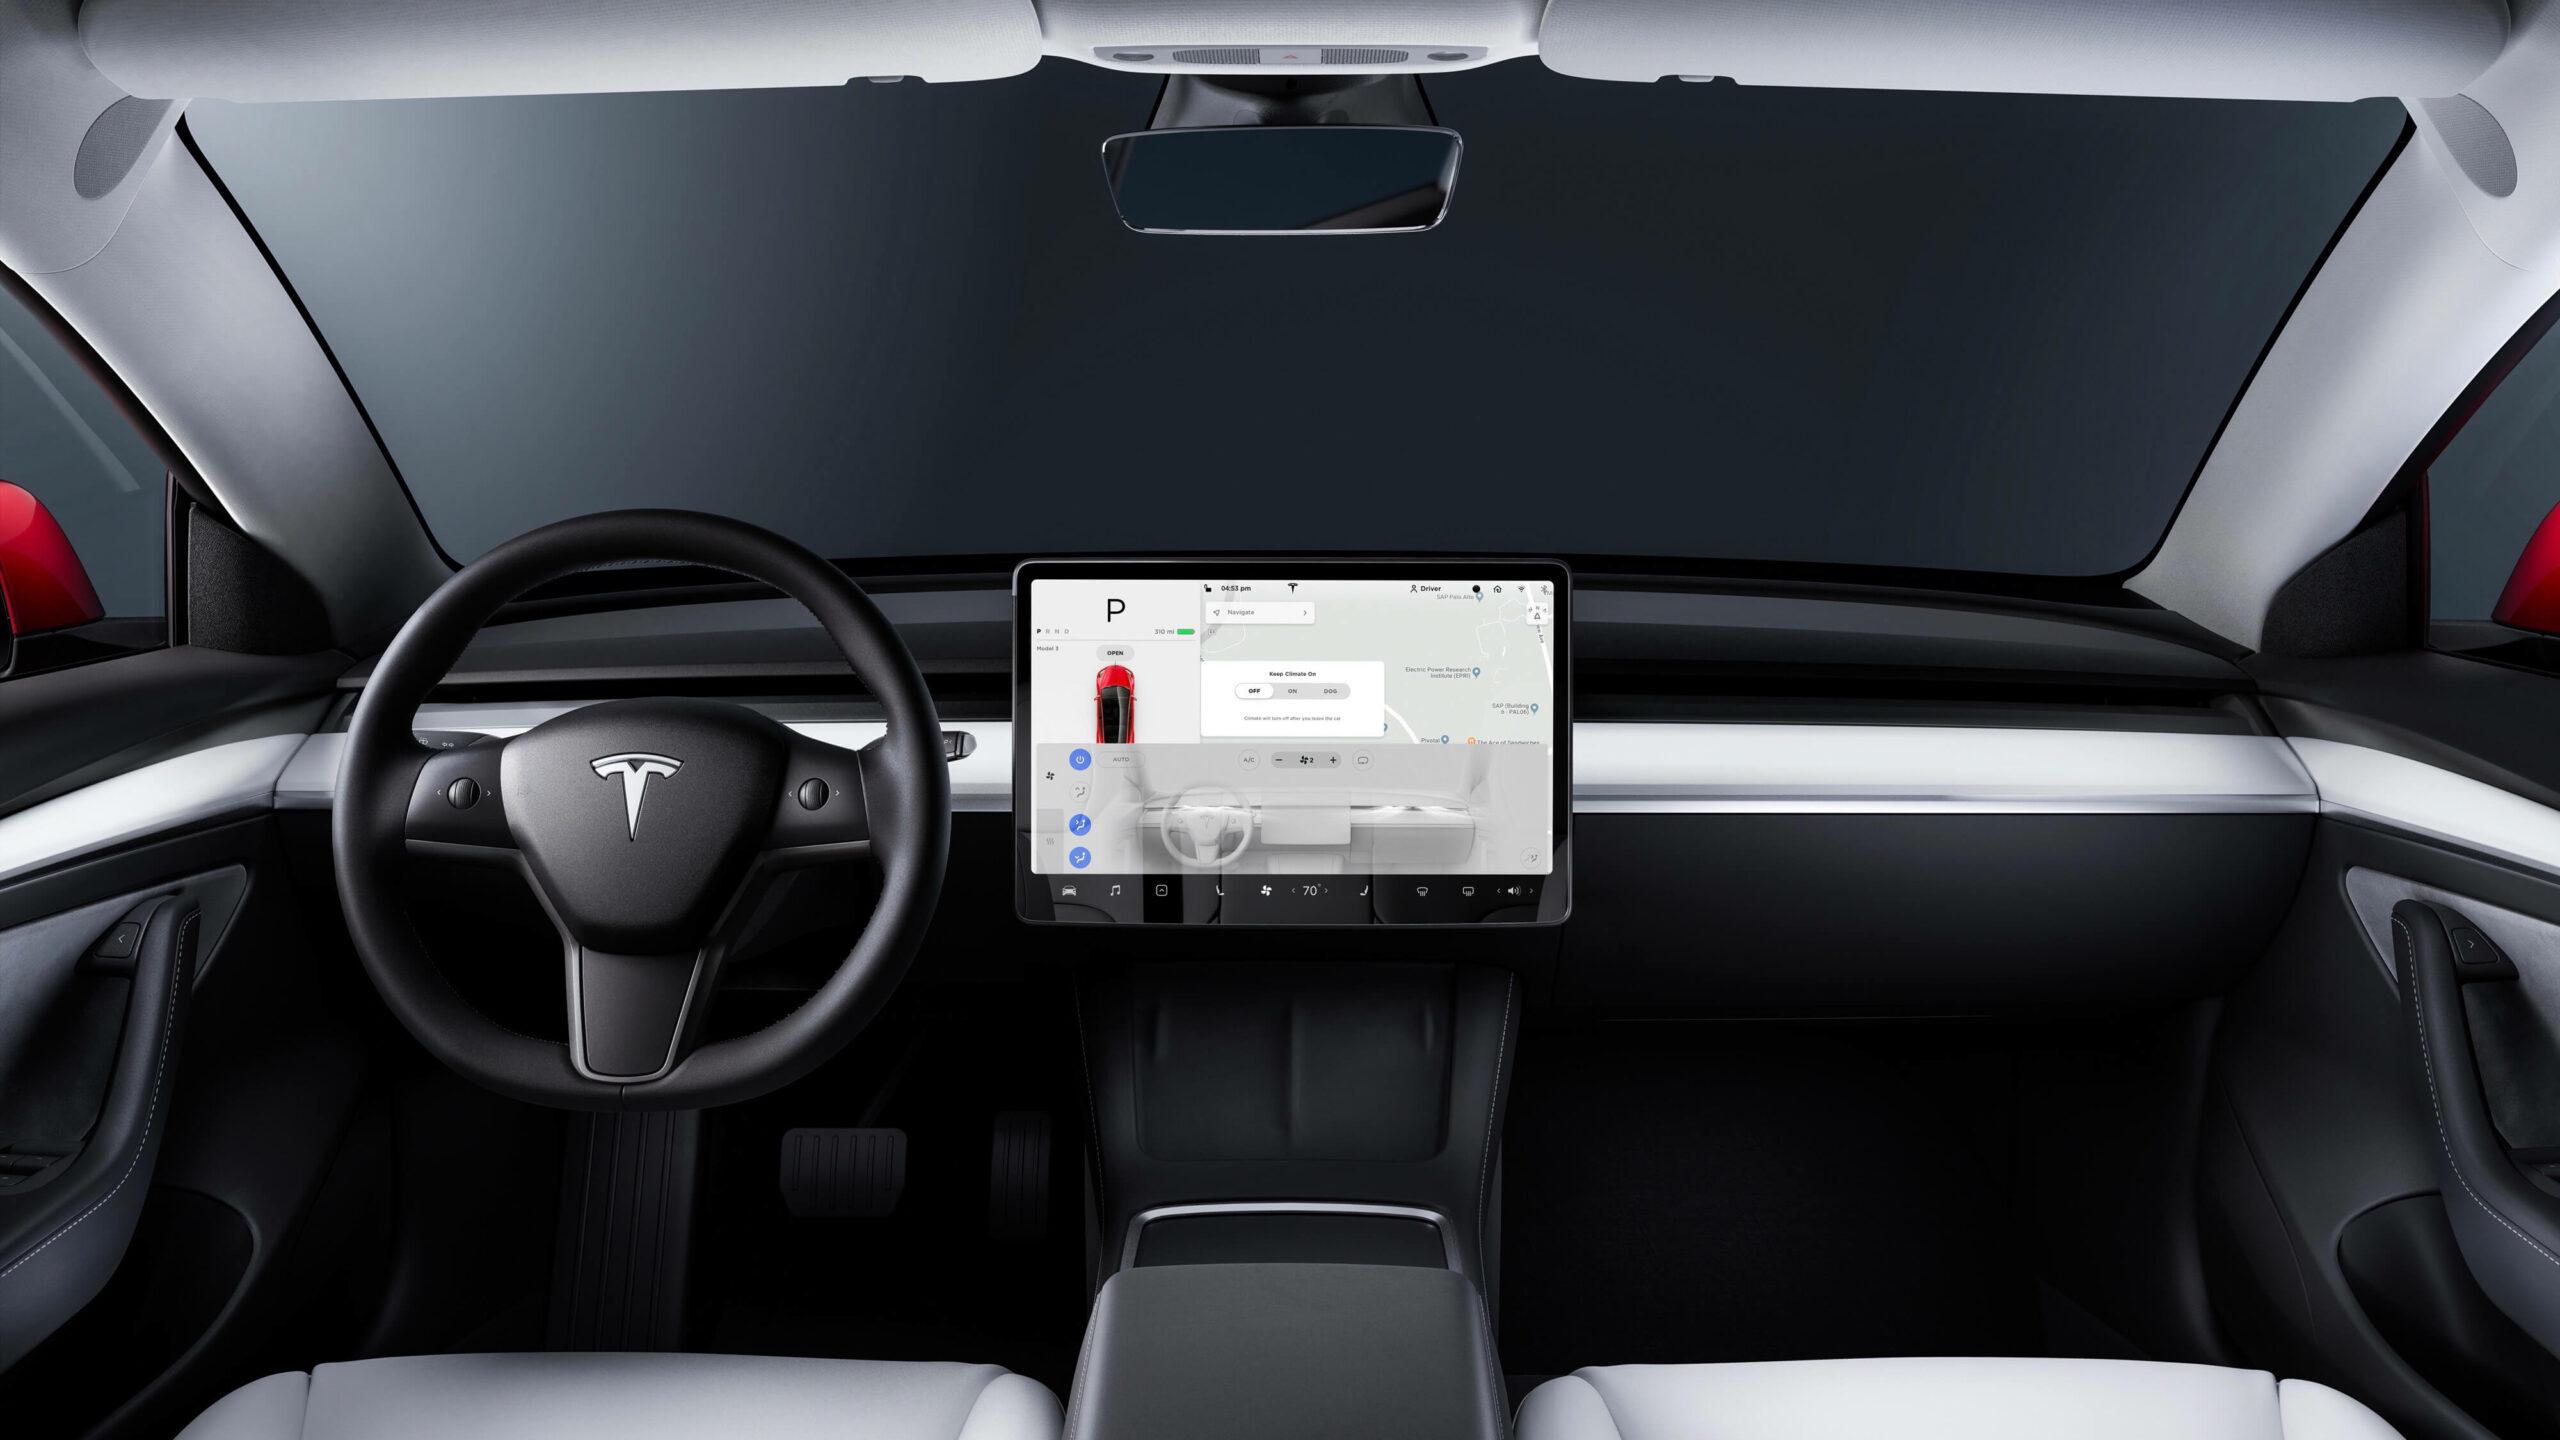 2021 Tesla Model 3 interieur